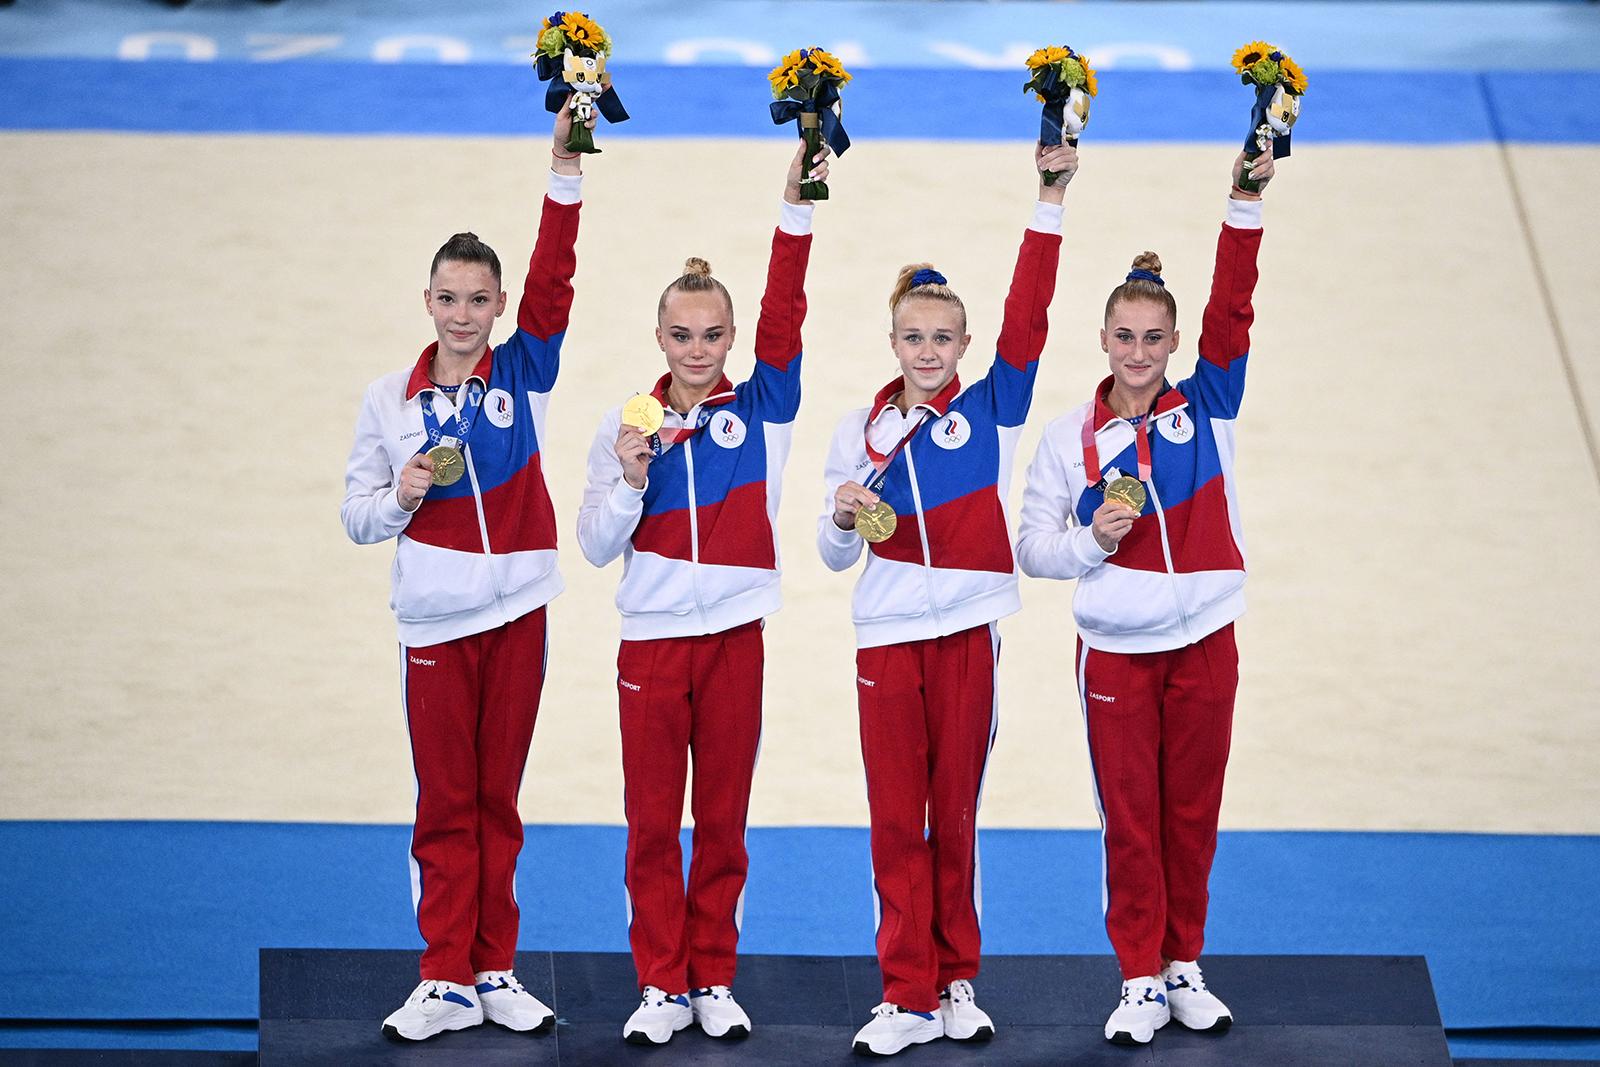 Russia's Liliia Akhaimova, Angelina Melnikova, Viktoriia Listunova and Vladislava Urazova celebrate on the podium after winning the artistic gymnastics women's team final in Tokyo on July 27.